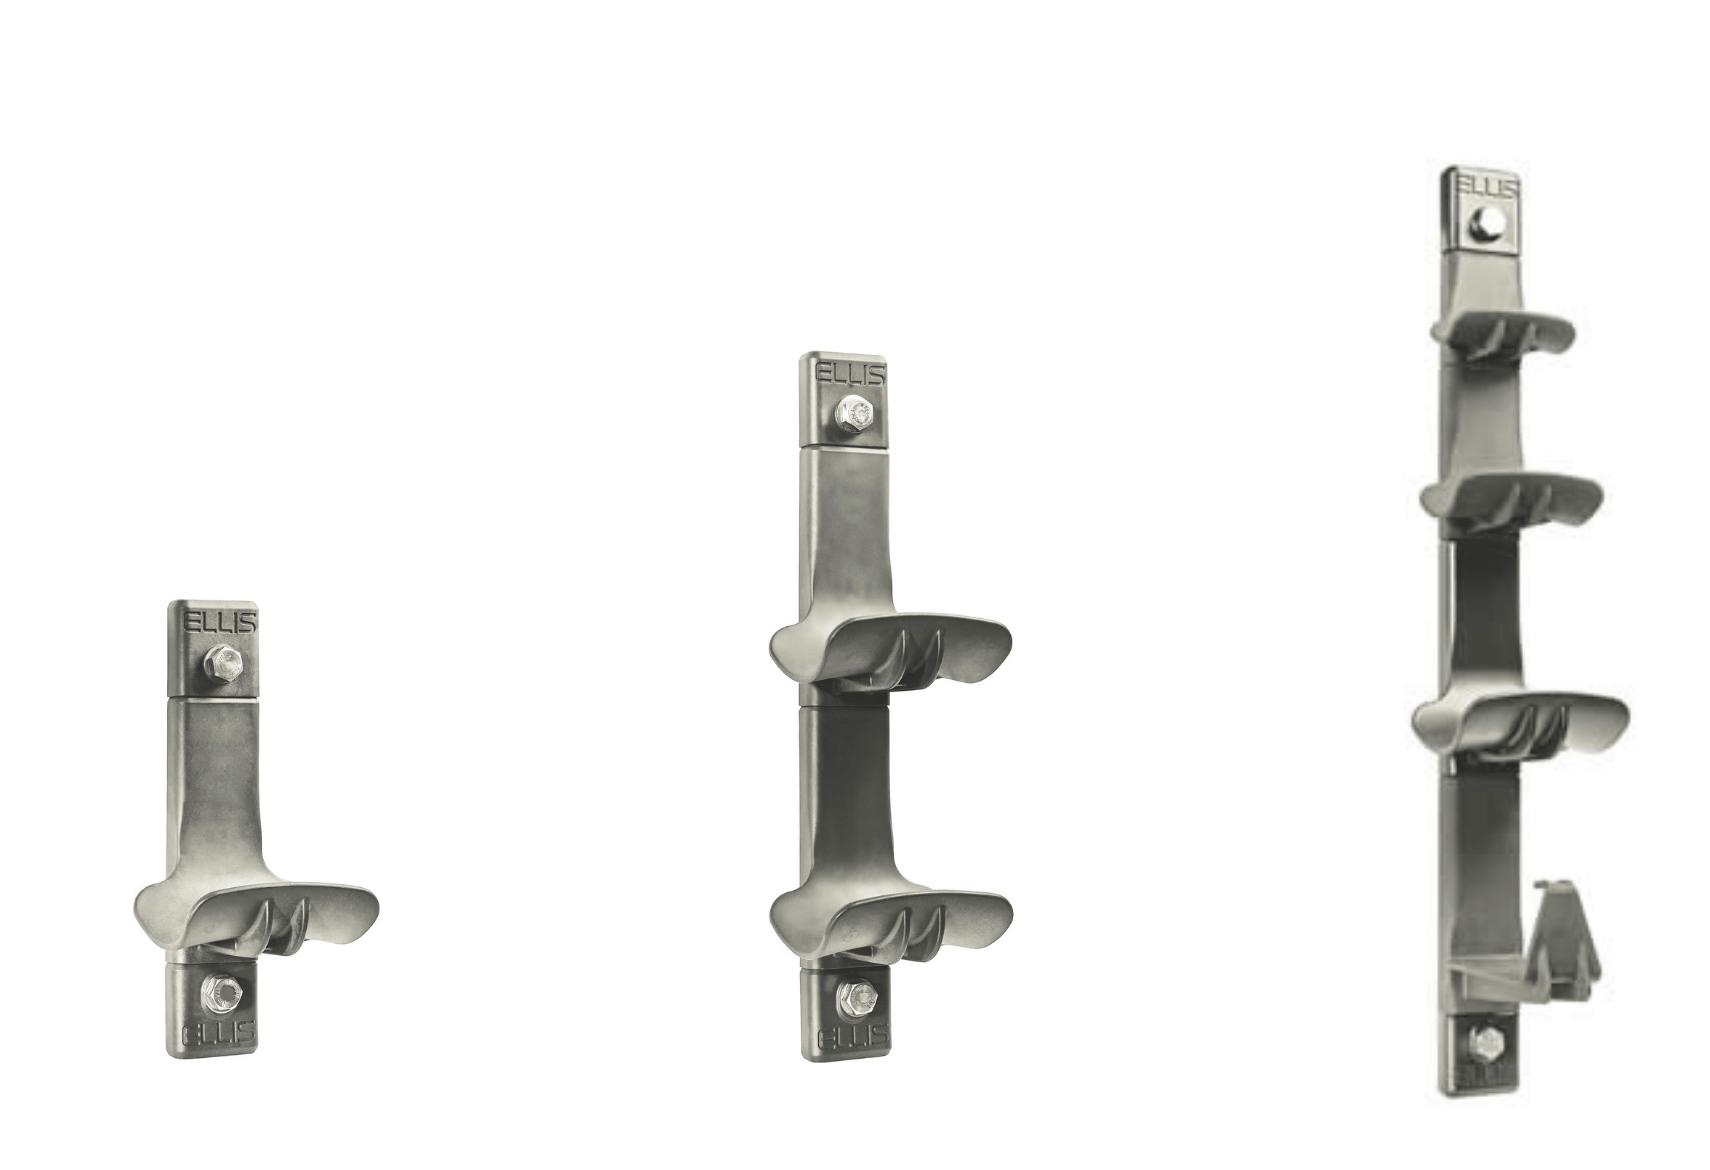 Ellis Pegasus Non Metallic Cable Hangers